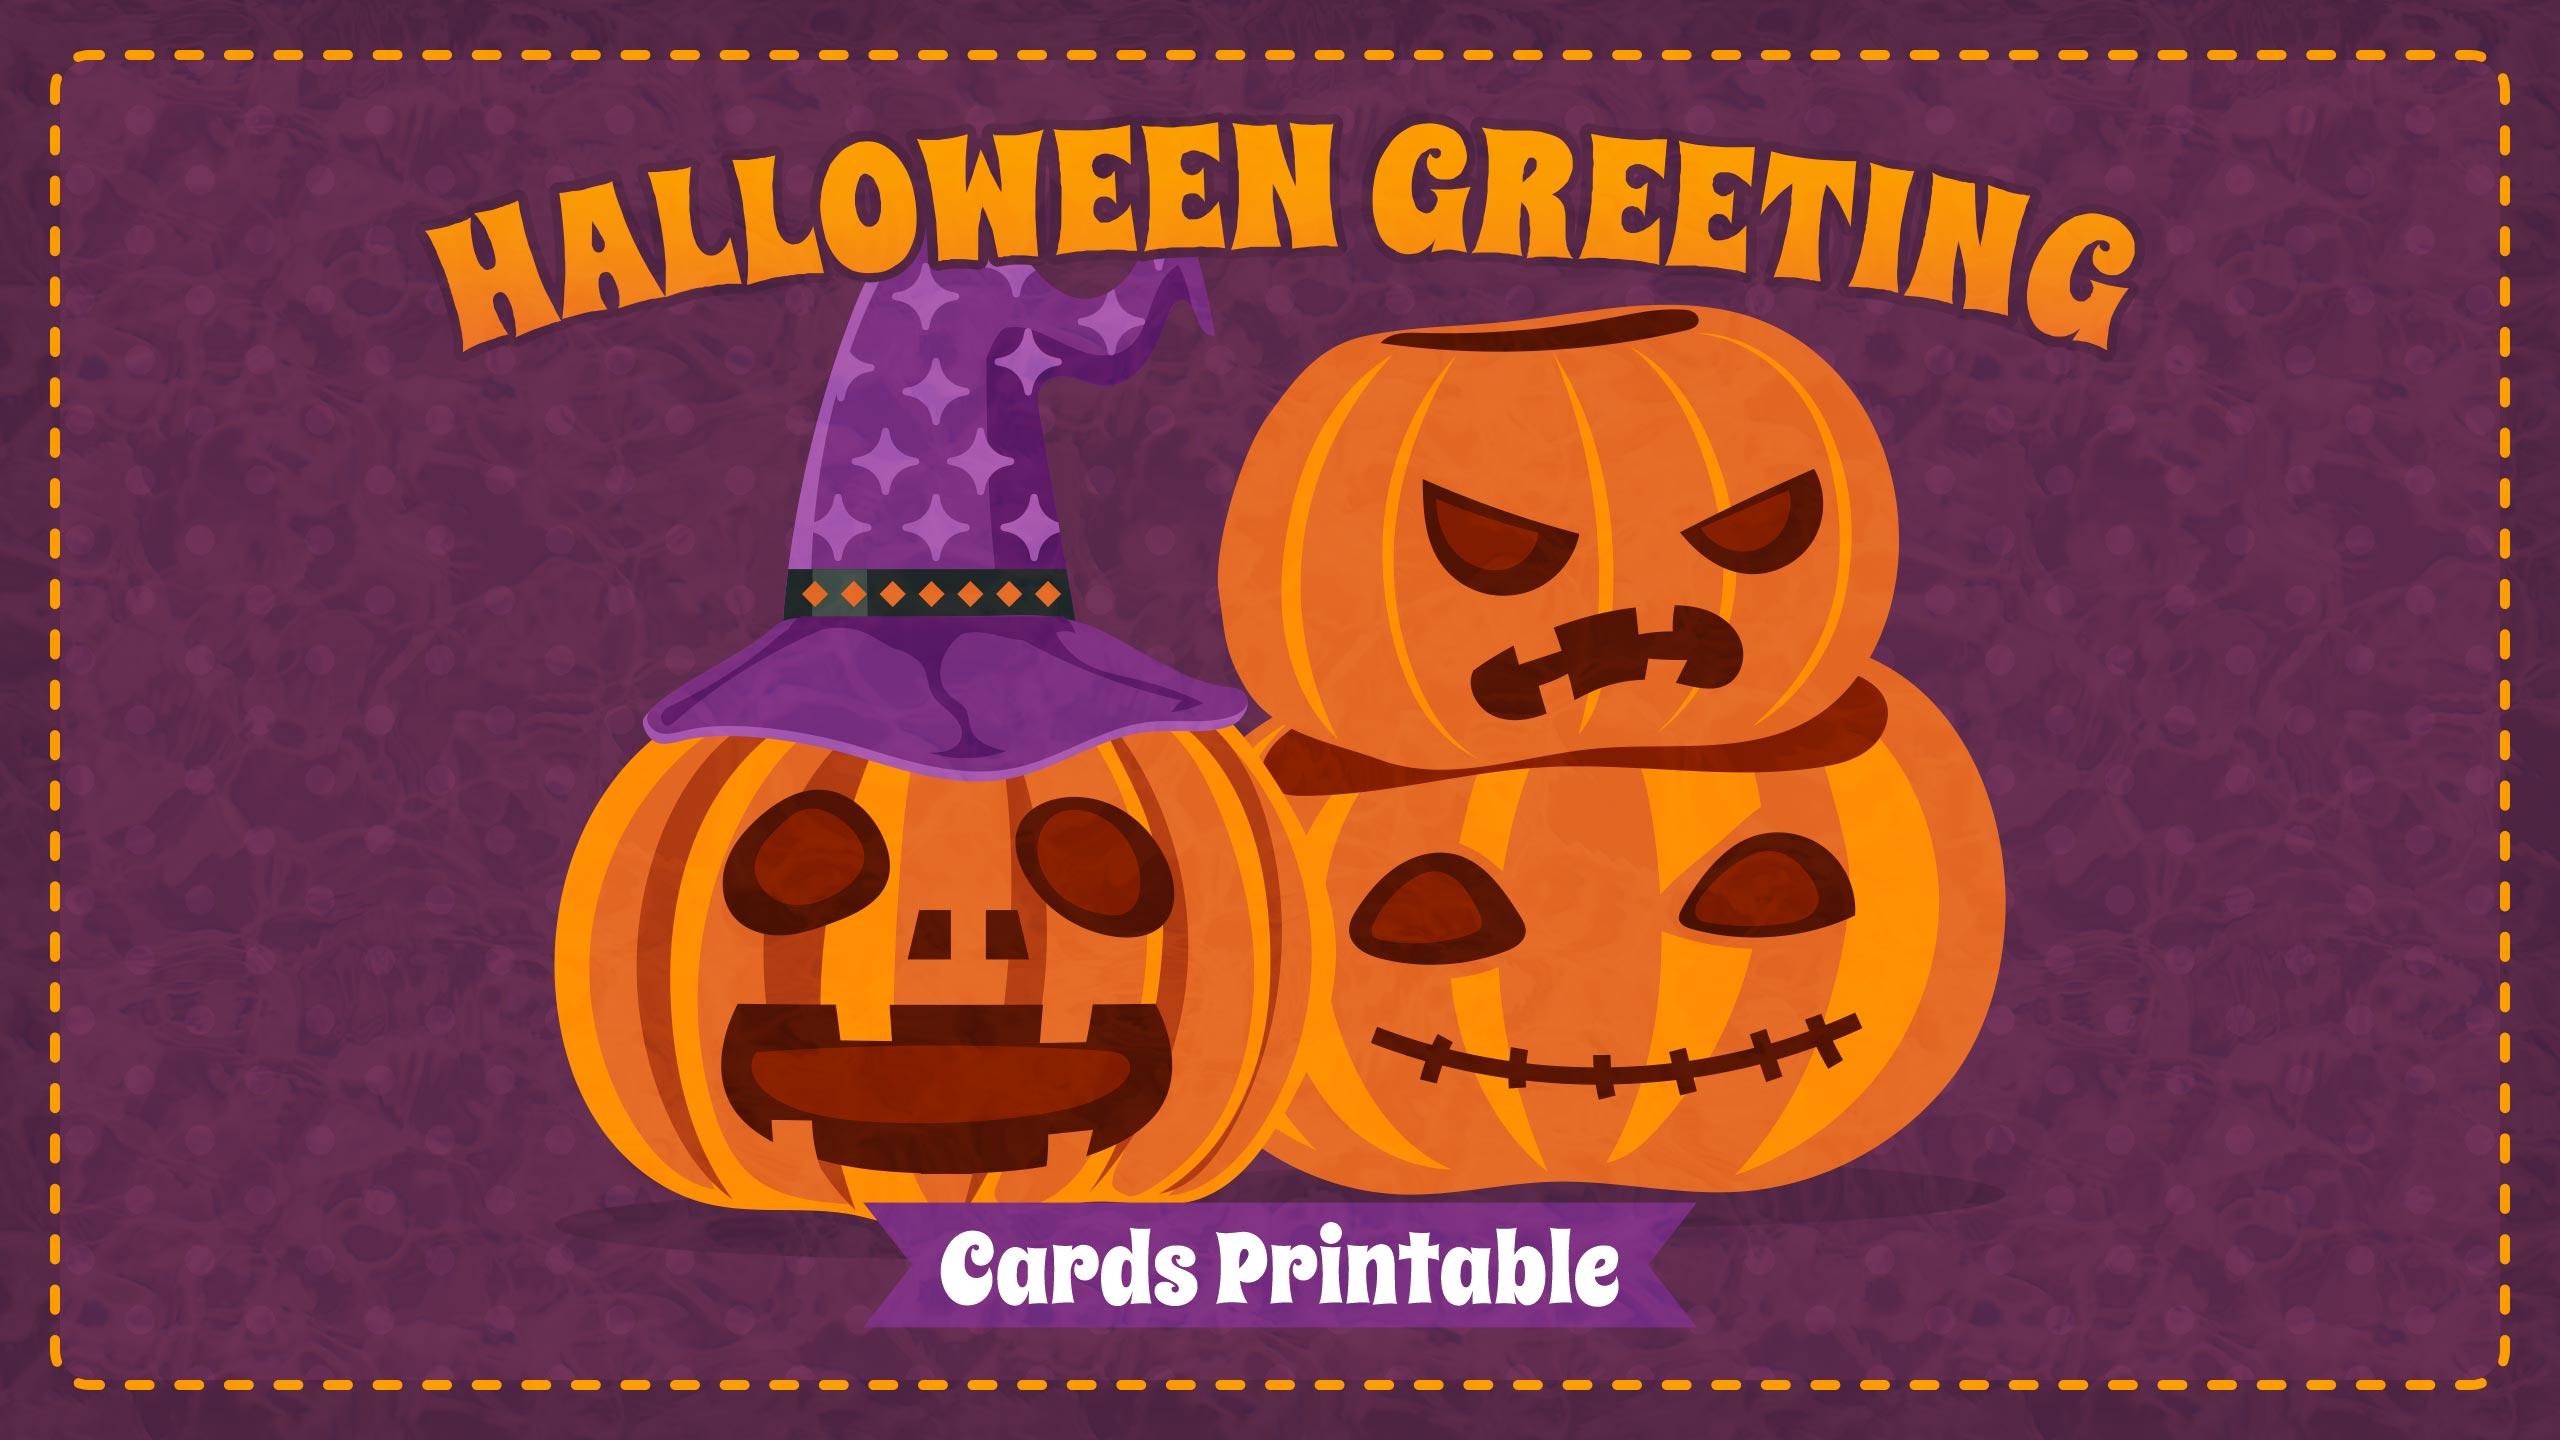 Halloween Greeting Cards Printable